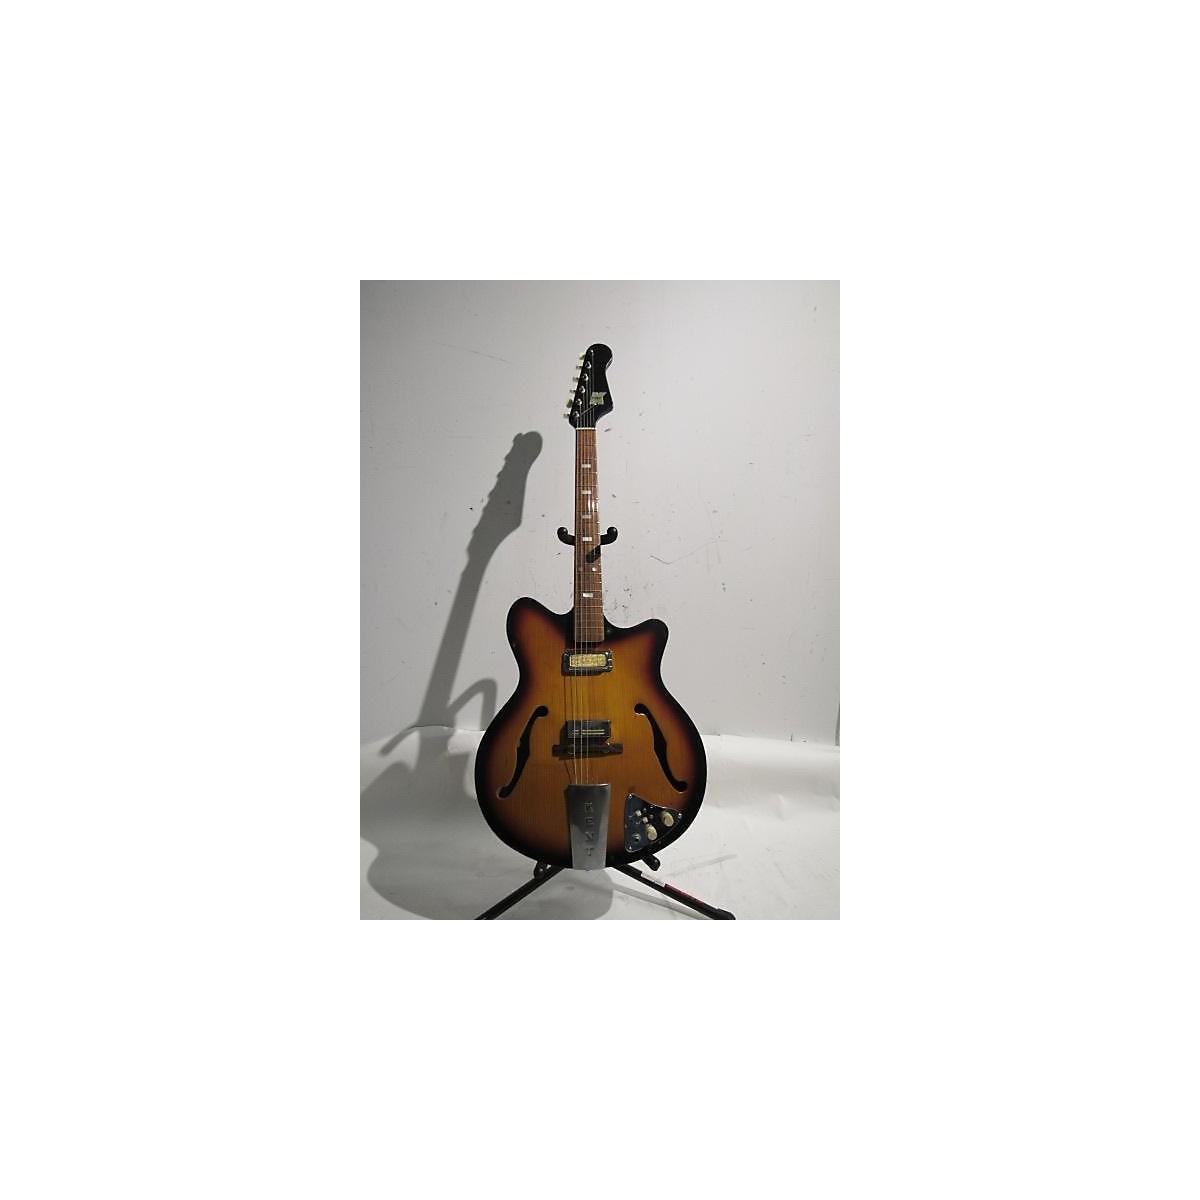 Kent 1960s Americana 2 Pick Up Hollow Body Electric Guitar